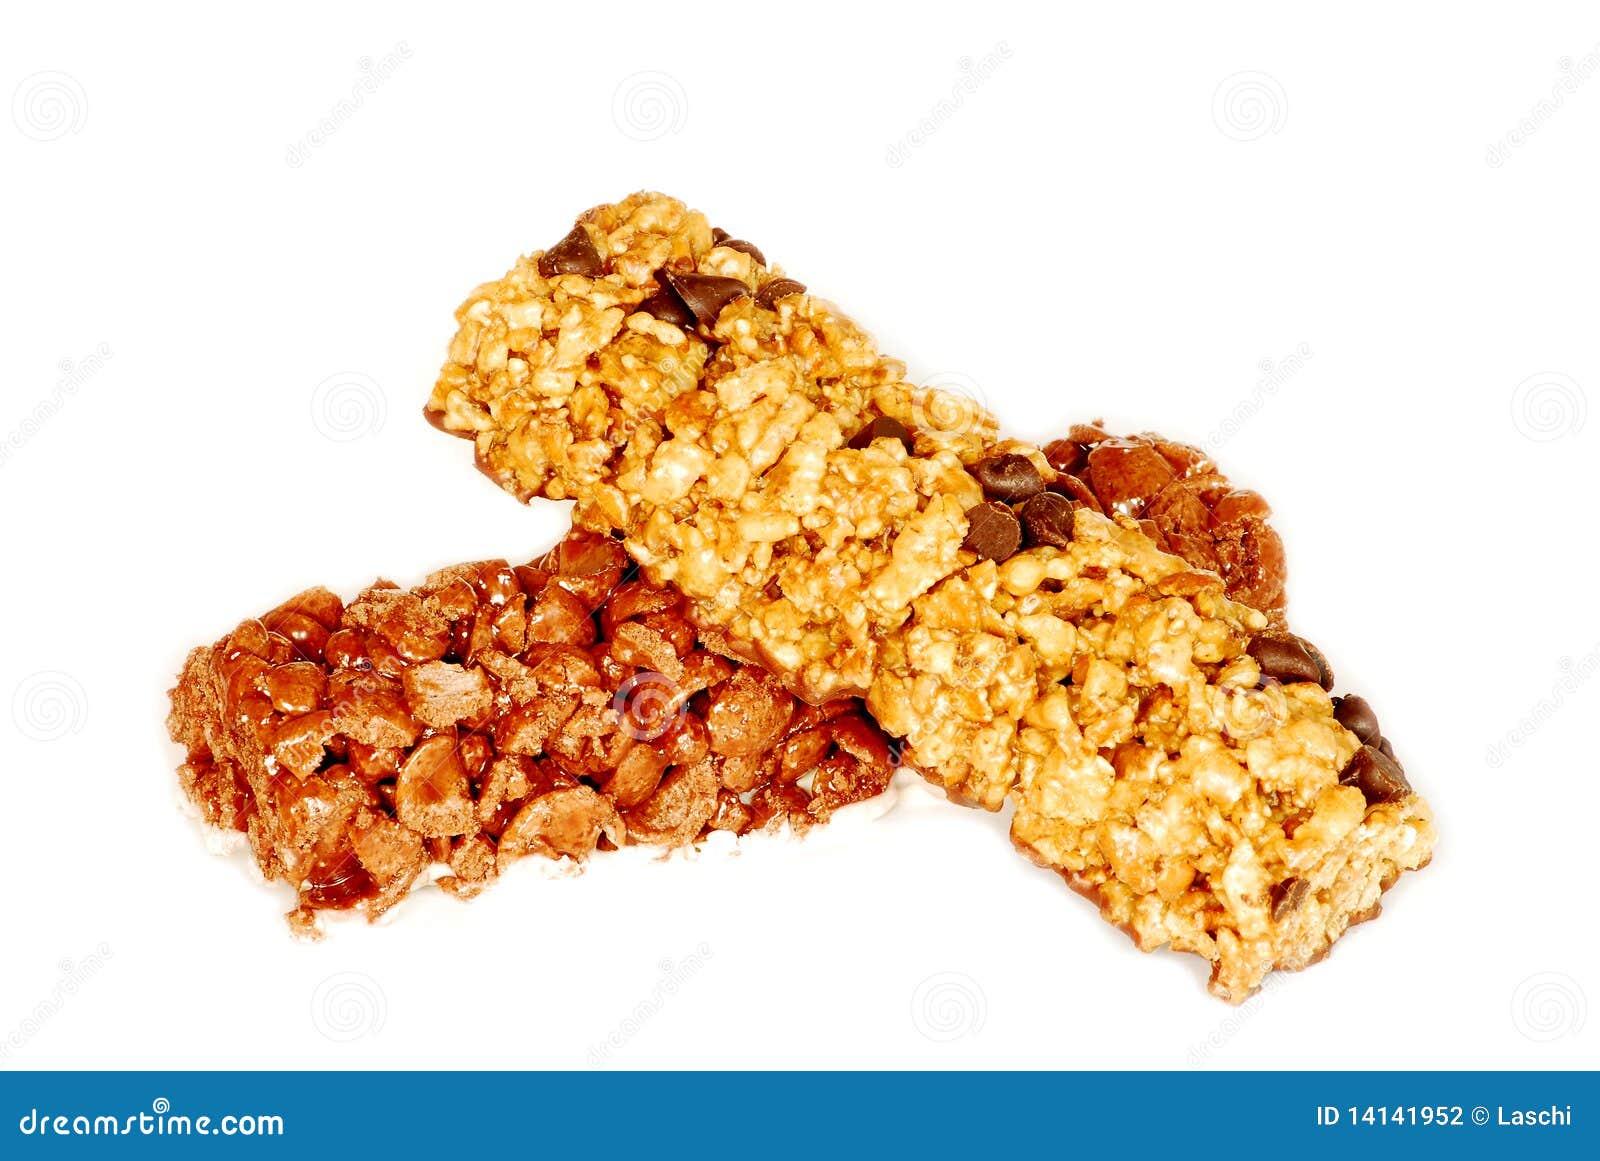 Cereal S'more Bars Recipes — Dishmaps